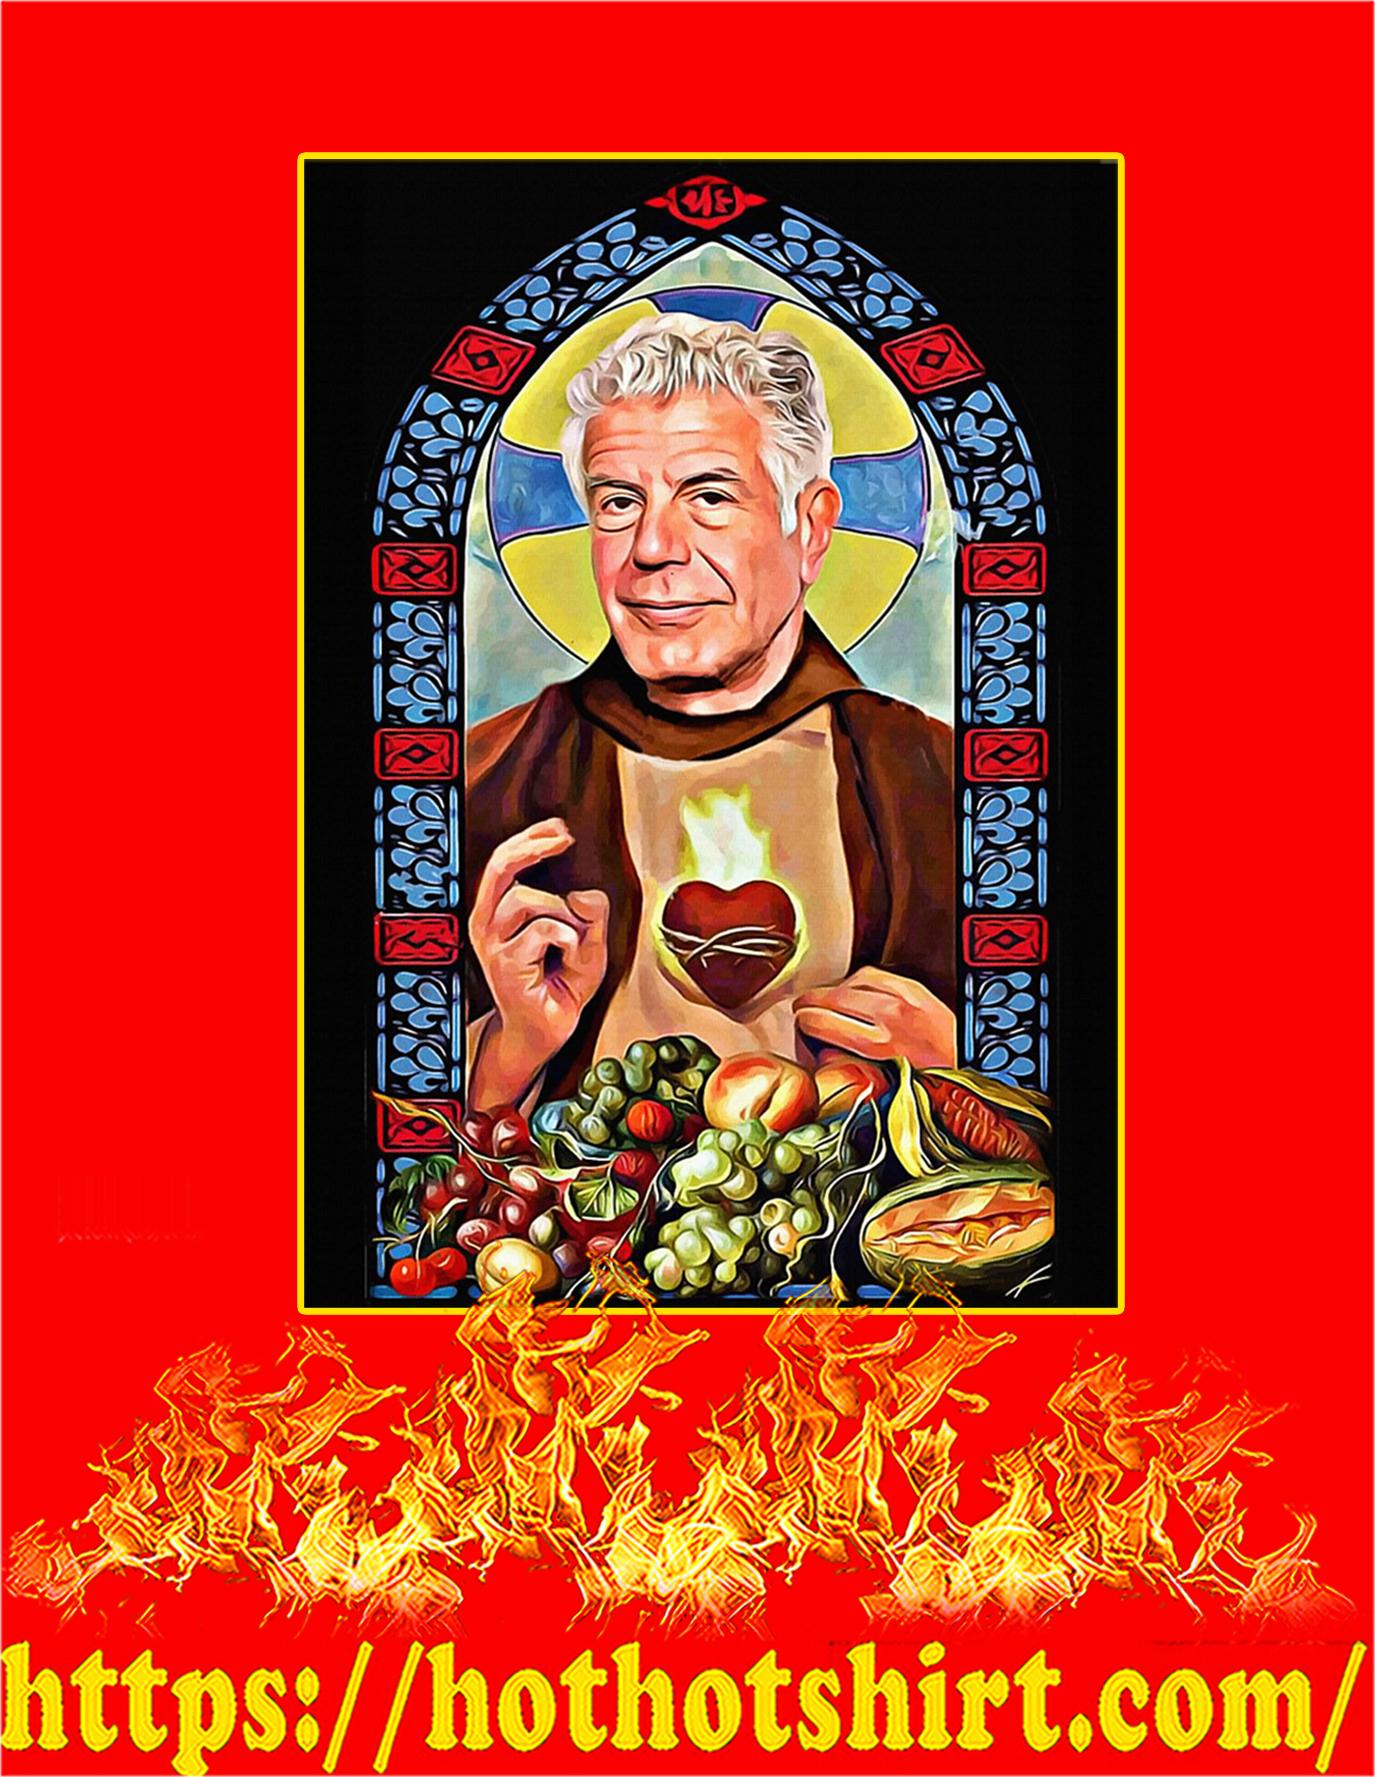 Patron saint of food and life prayer poster - A2